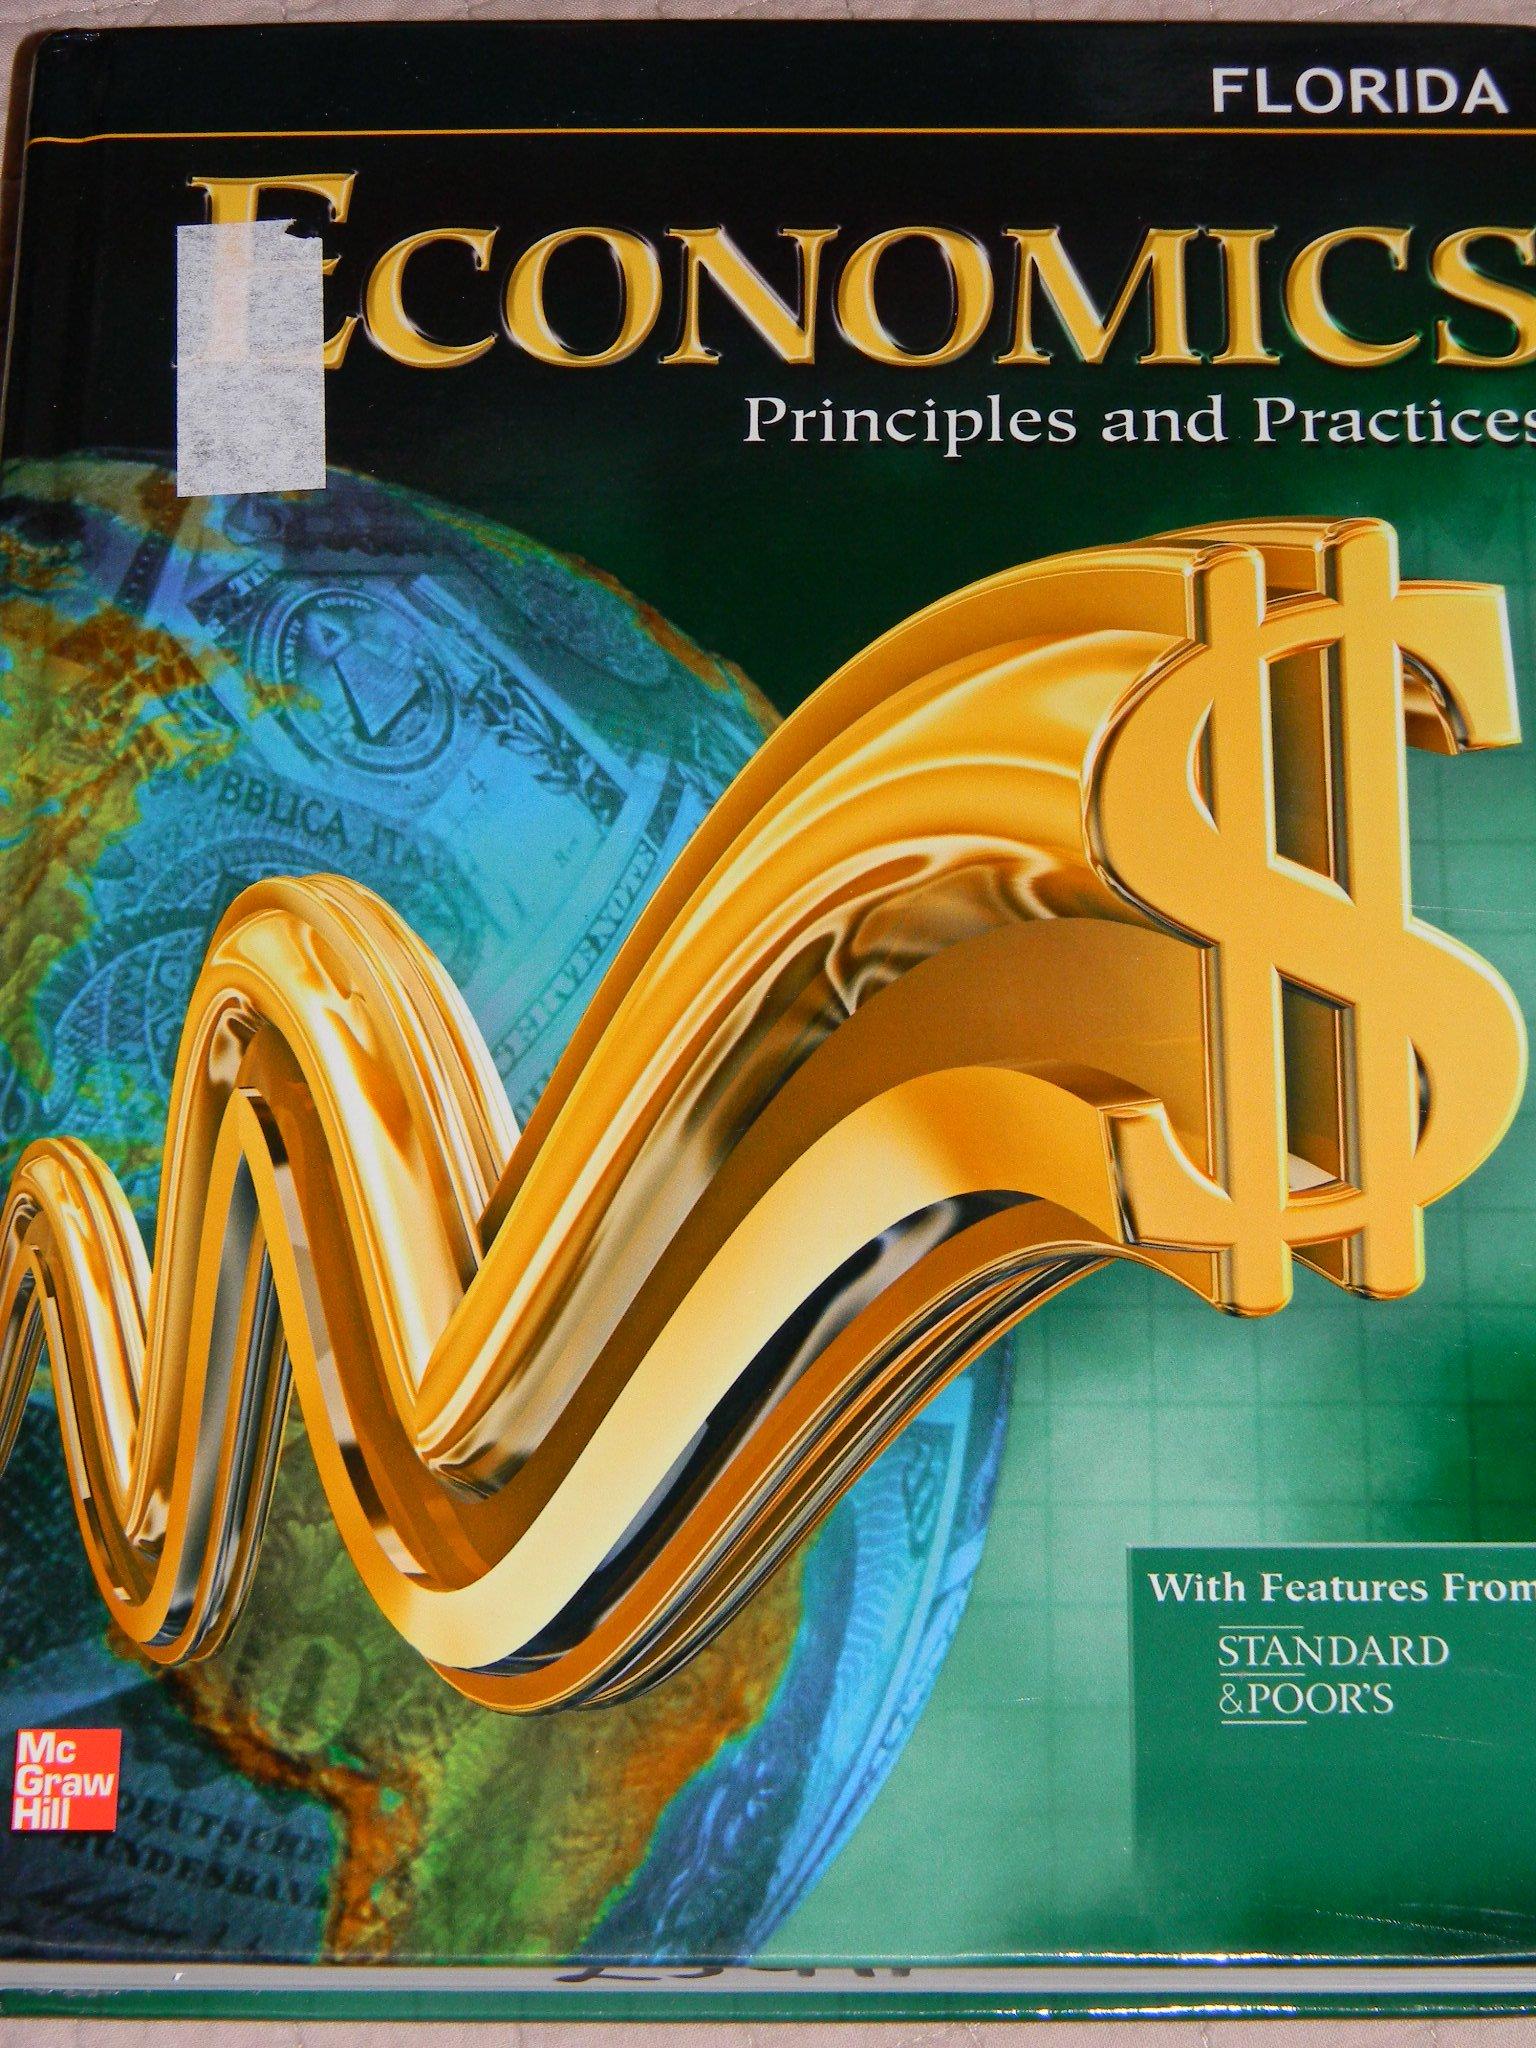 Economics Principles and Practices, Florida Edition: Ph.D. Gary E. Clayton:  9780076614943: Amazon.com: Books